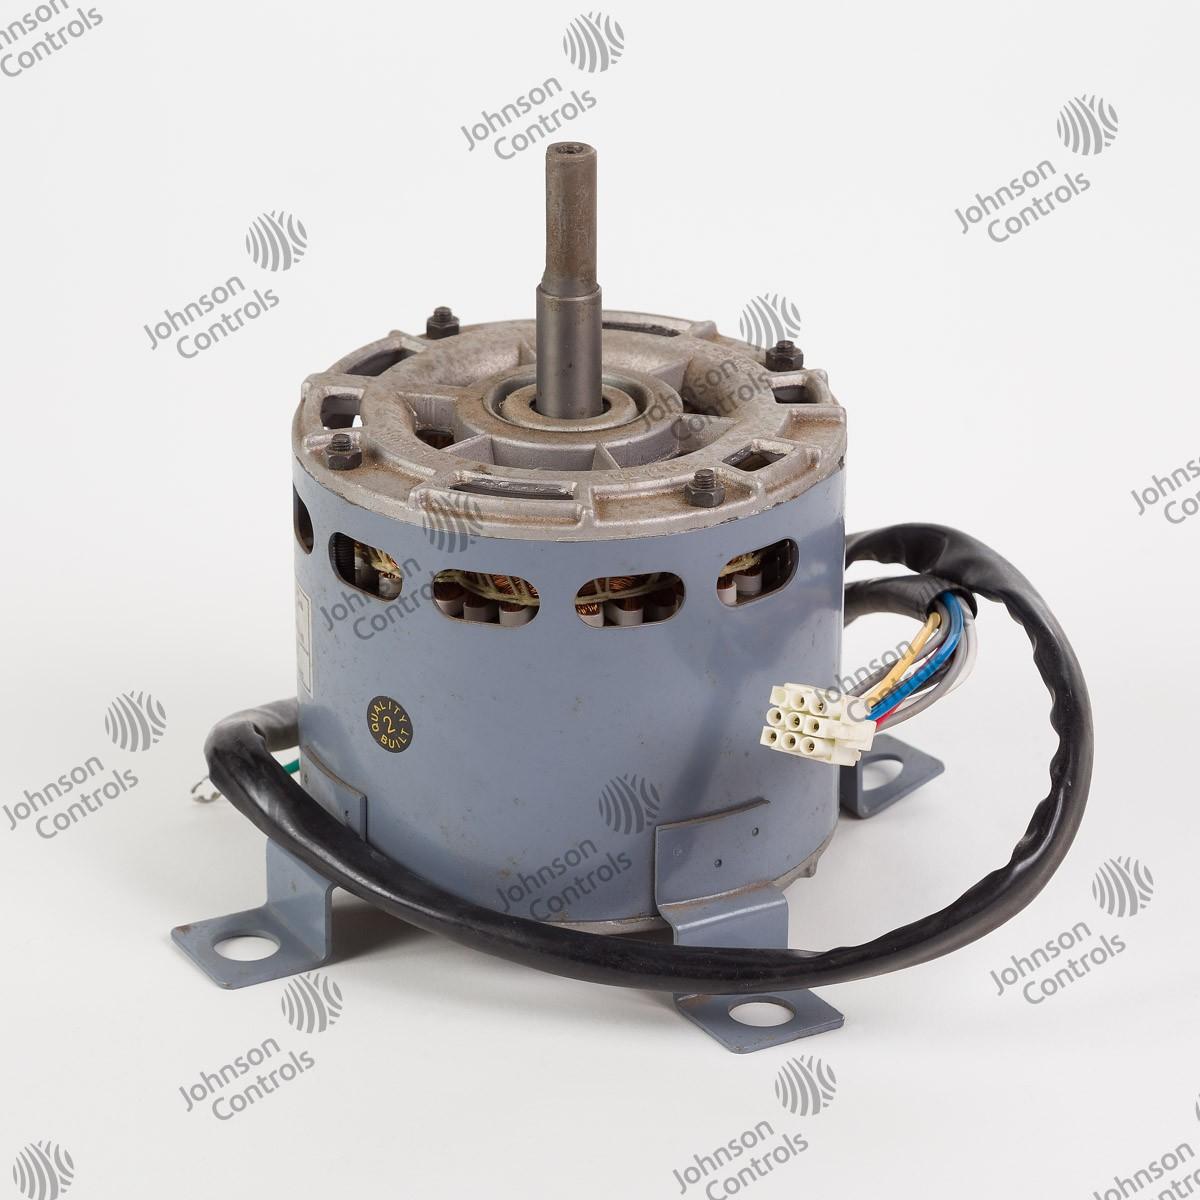 MOTOR DF3G4008K P/ MK 45P - 024T04104-000